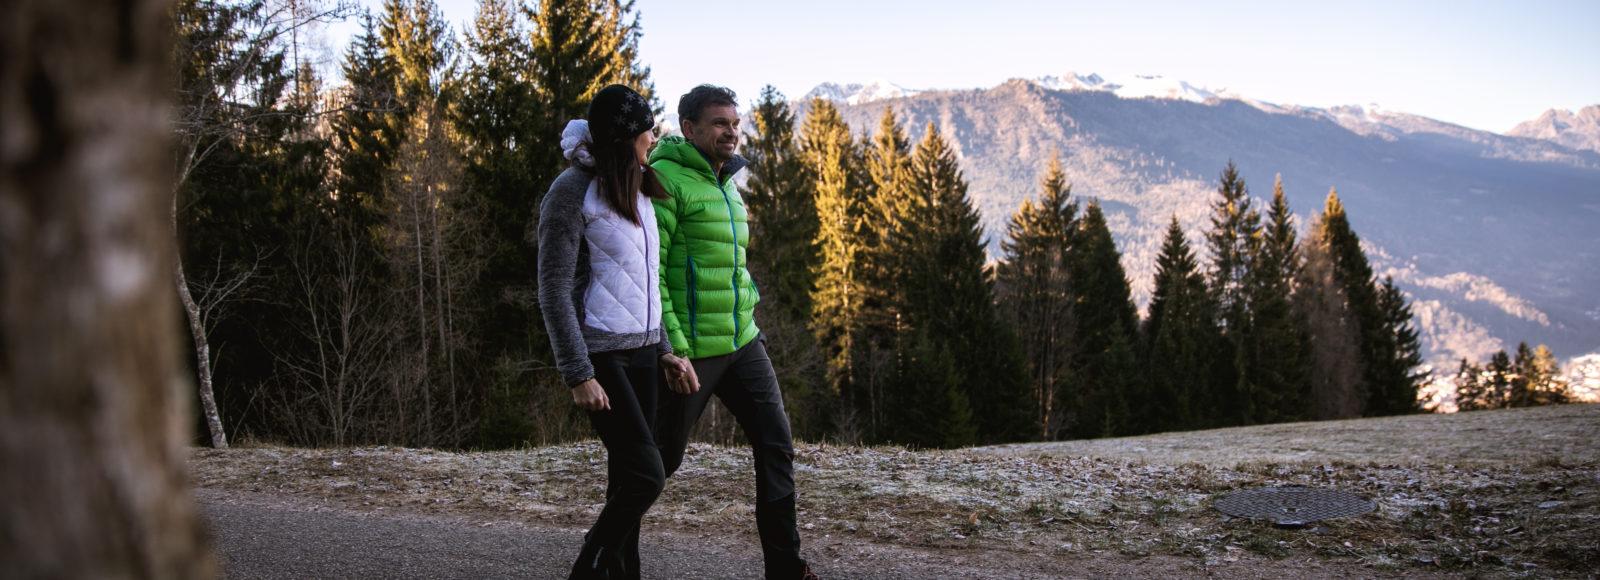 Inverno & benessere - weekend - Hotel Isolabella - Trentino